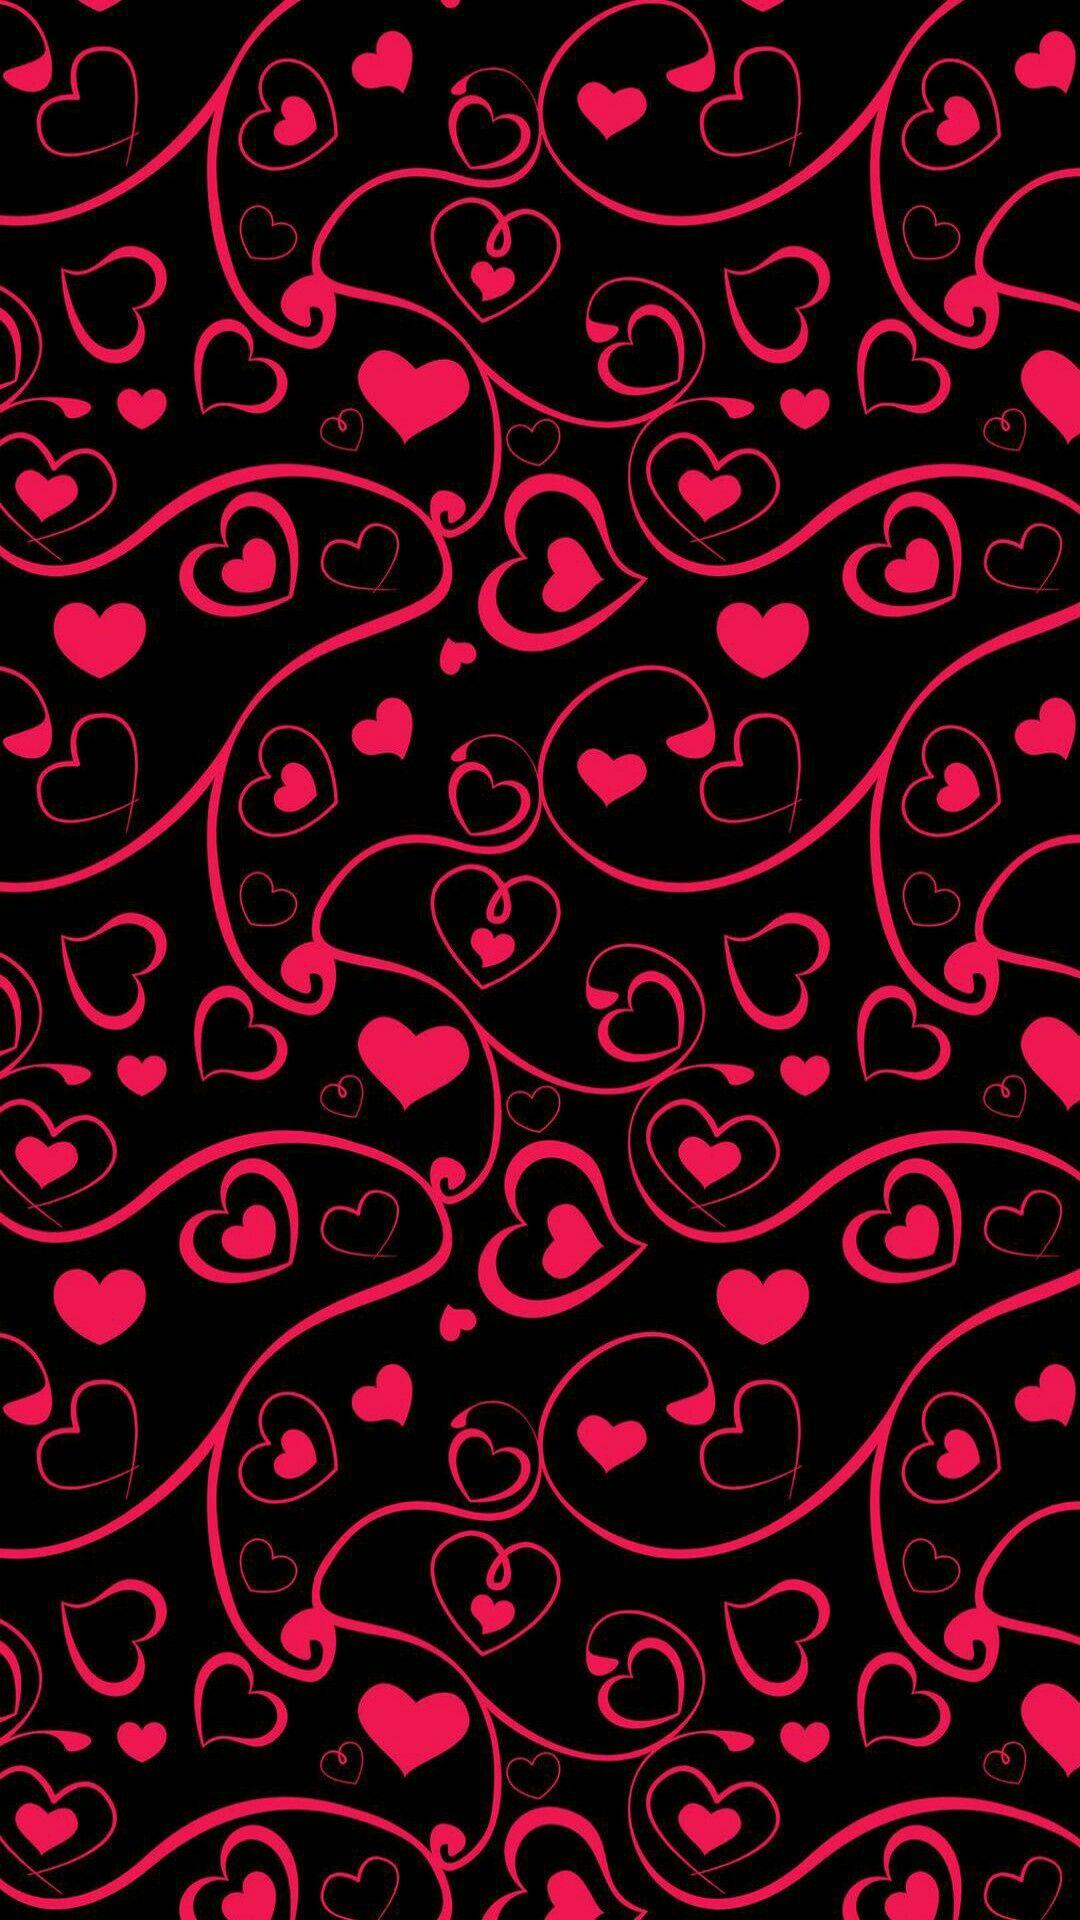 38 Trendy Wallpaper Iphone Black Red Hello Kitty Hello Kitty Valentines Wallpaper Wallpaper Iphone Love Black Phone Wallpaper